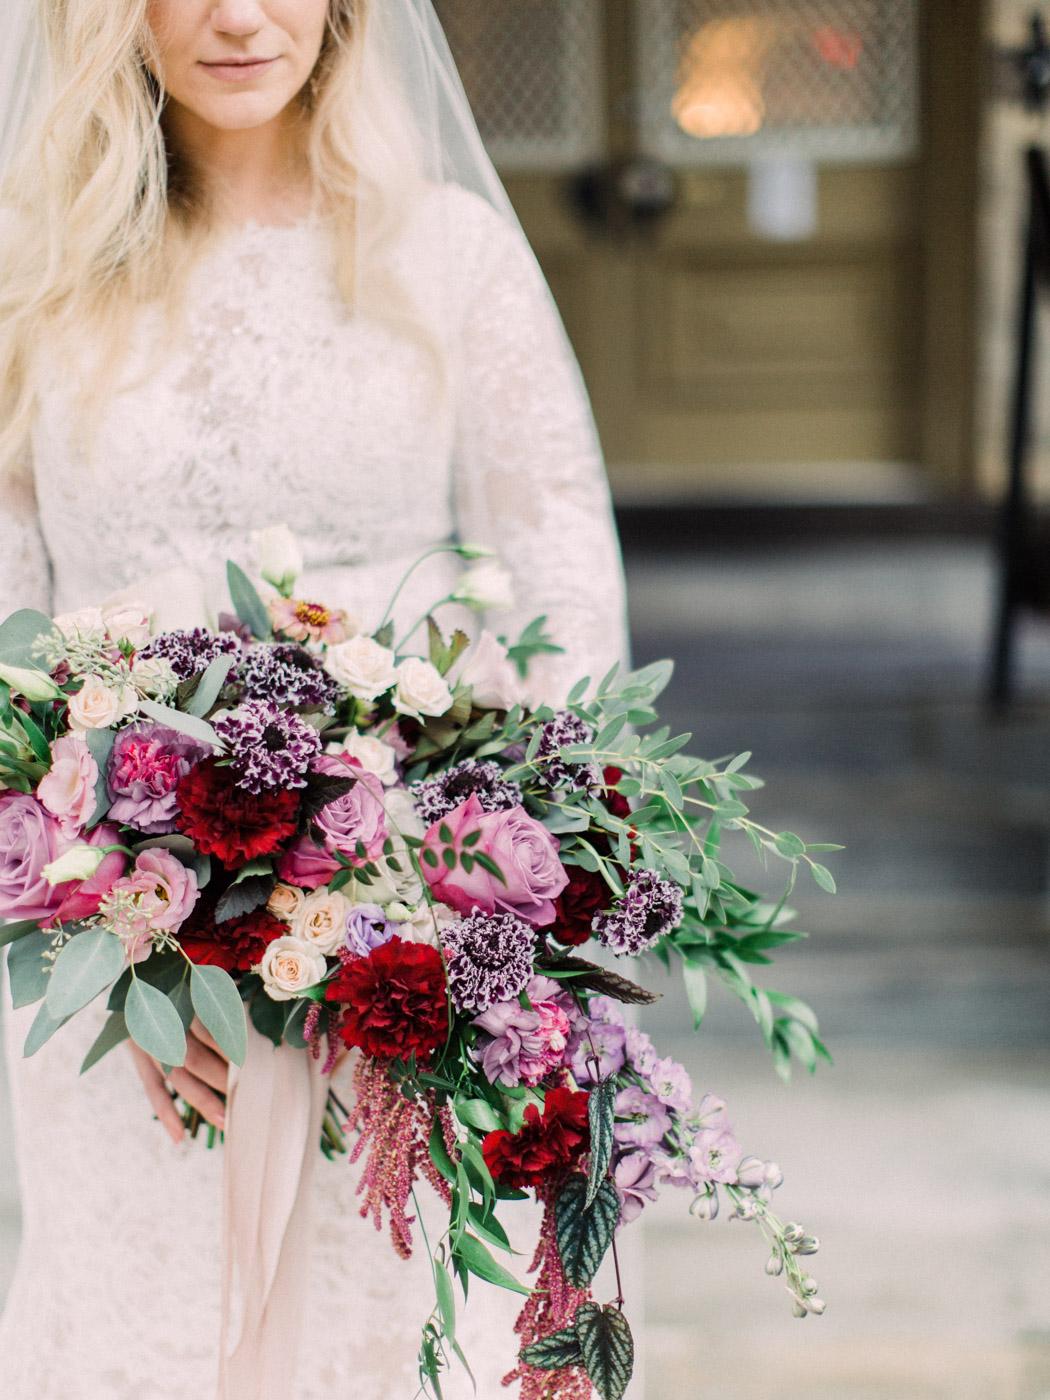 Toronto-wedding-photographer-intimate-classic-fine-art-elopement-ottawa40.jpg